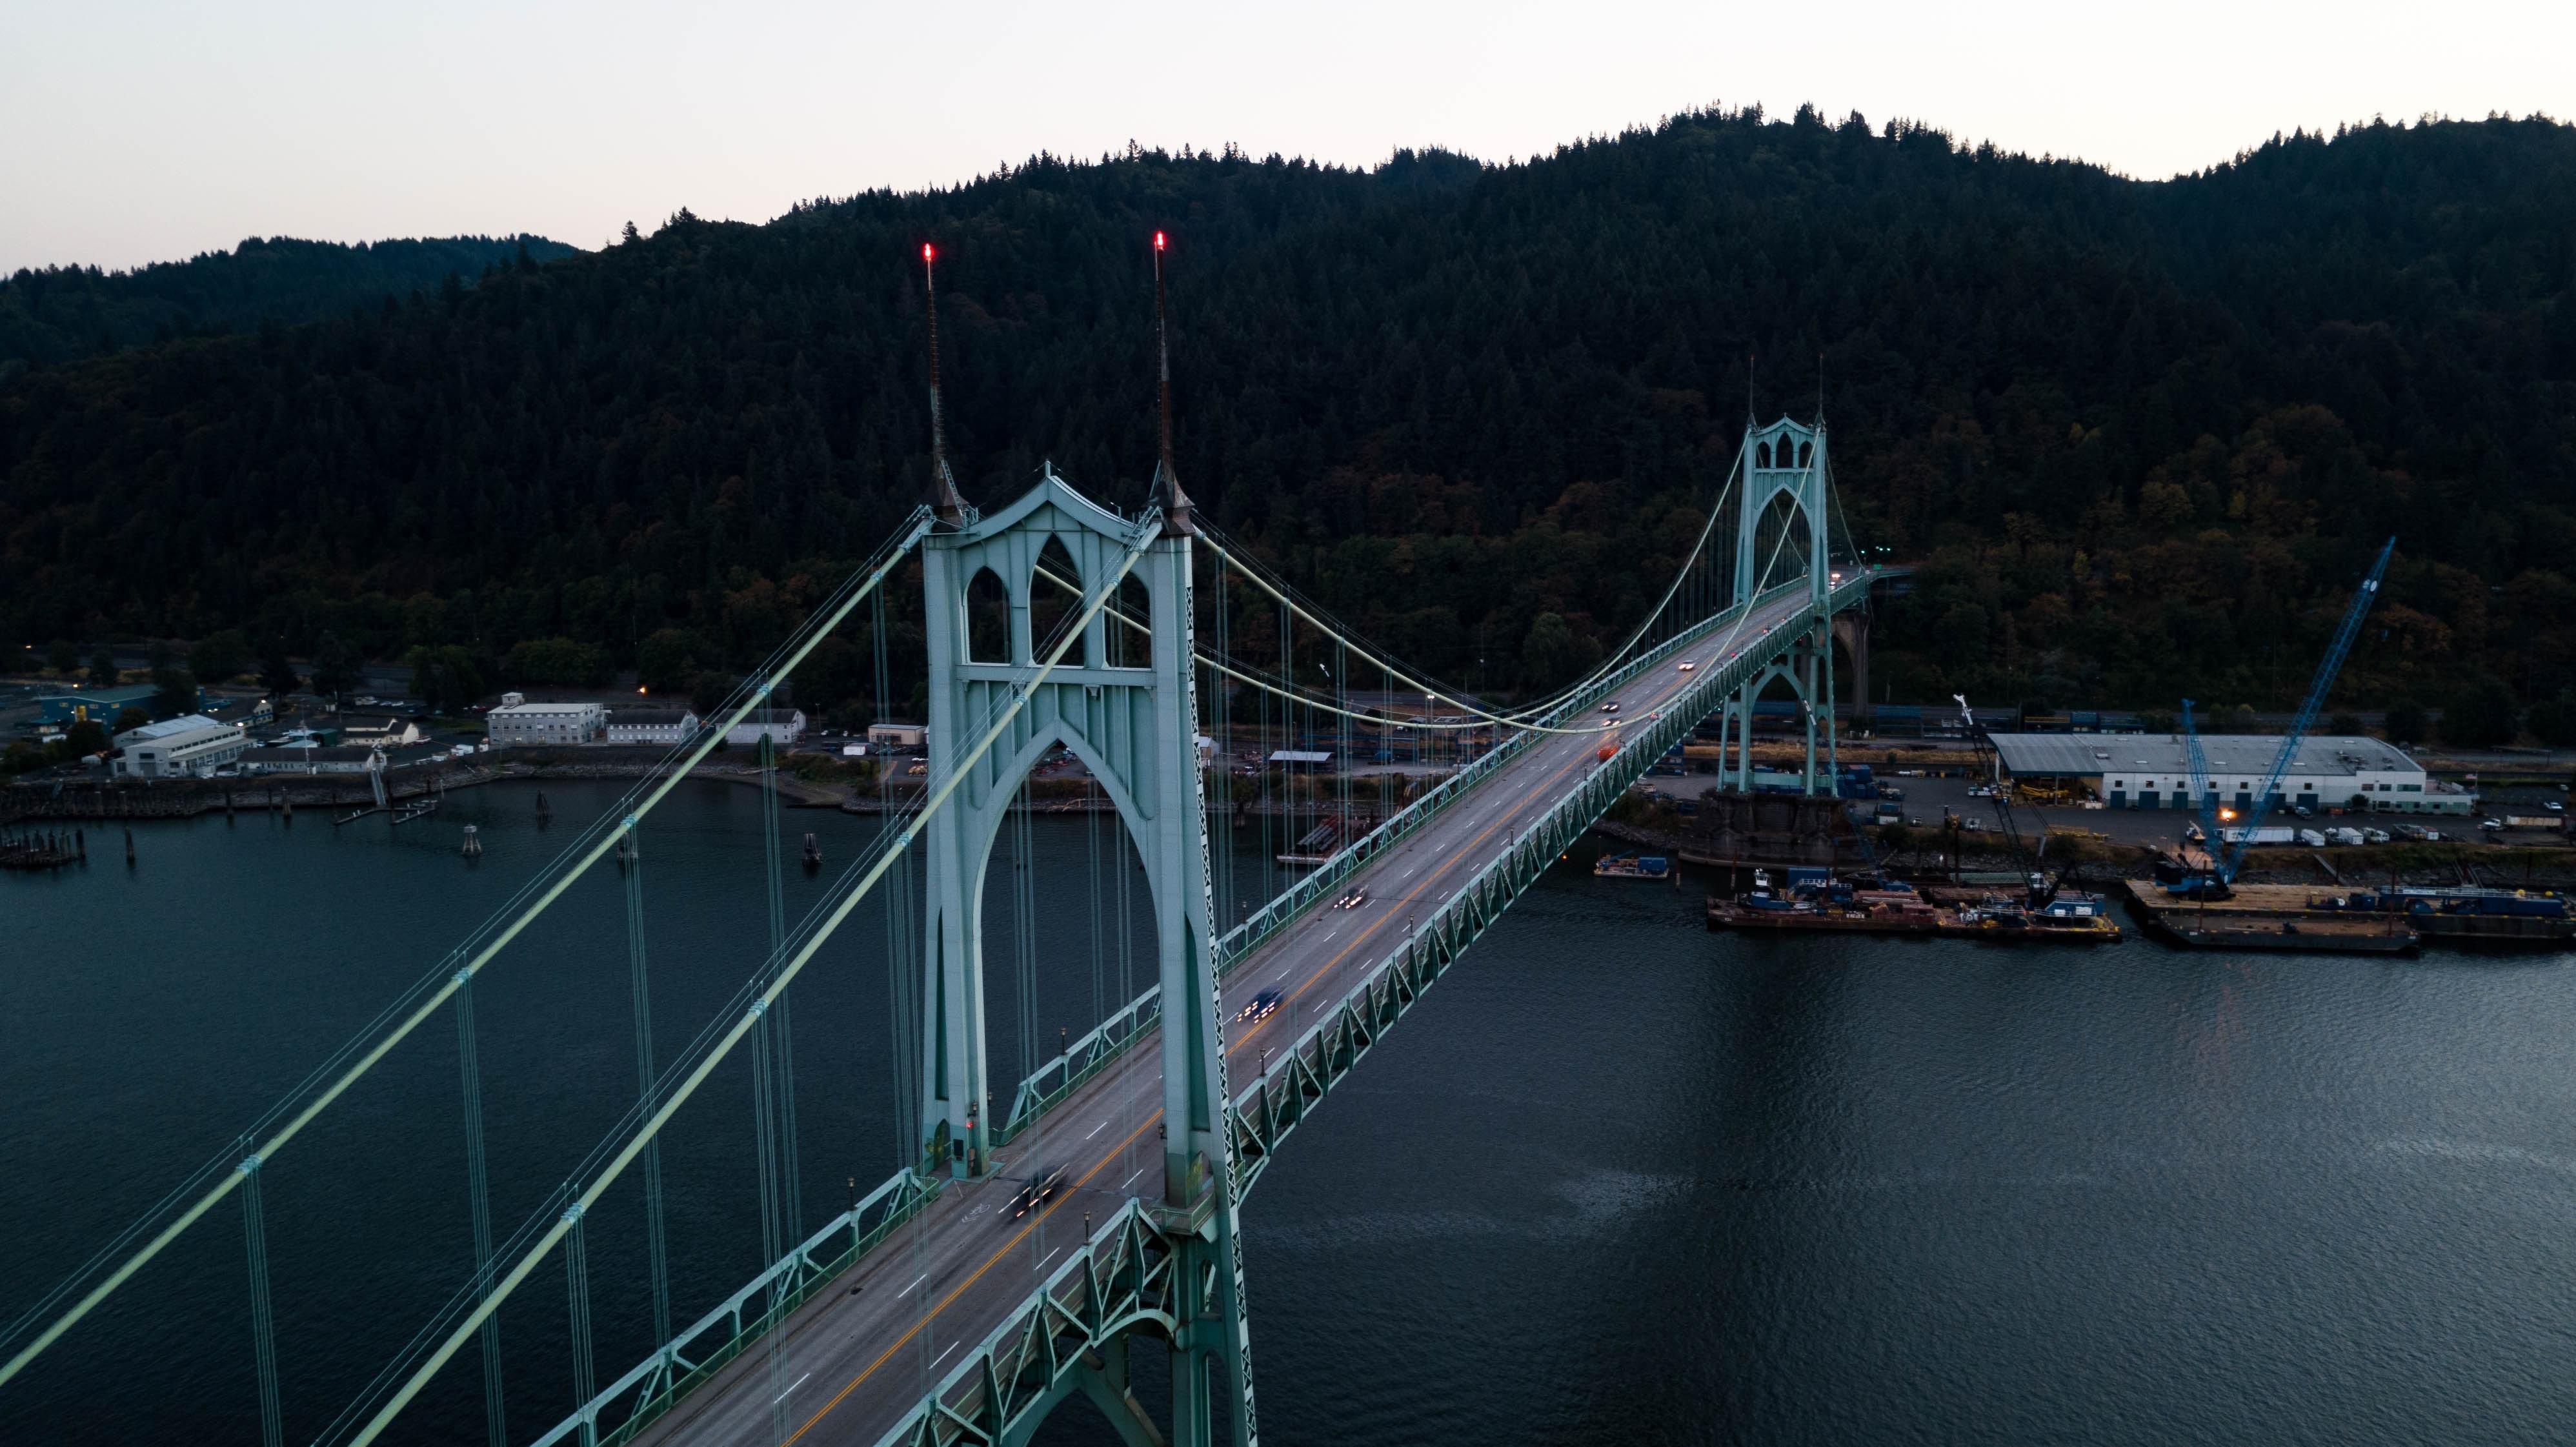 rope bridge above body of water